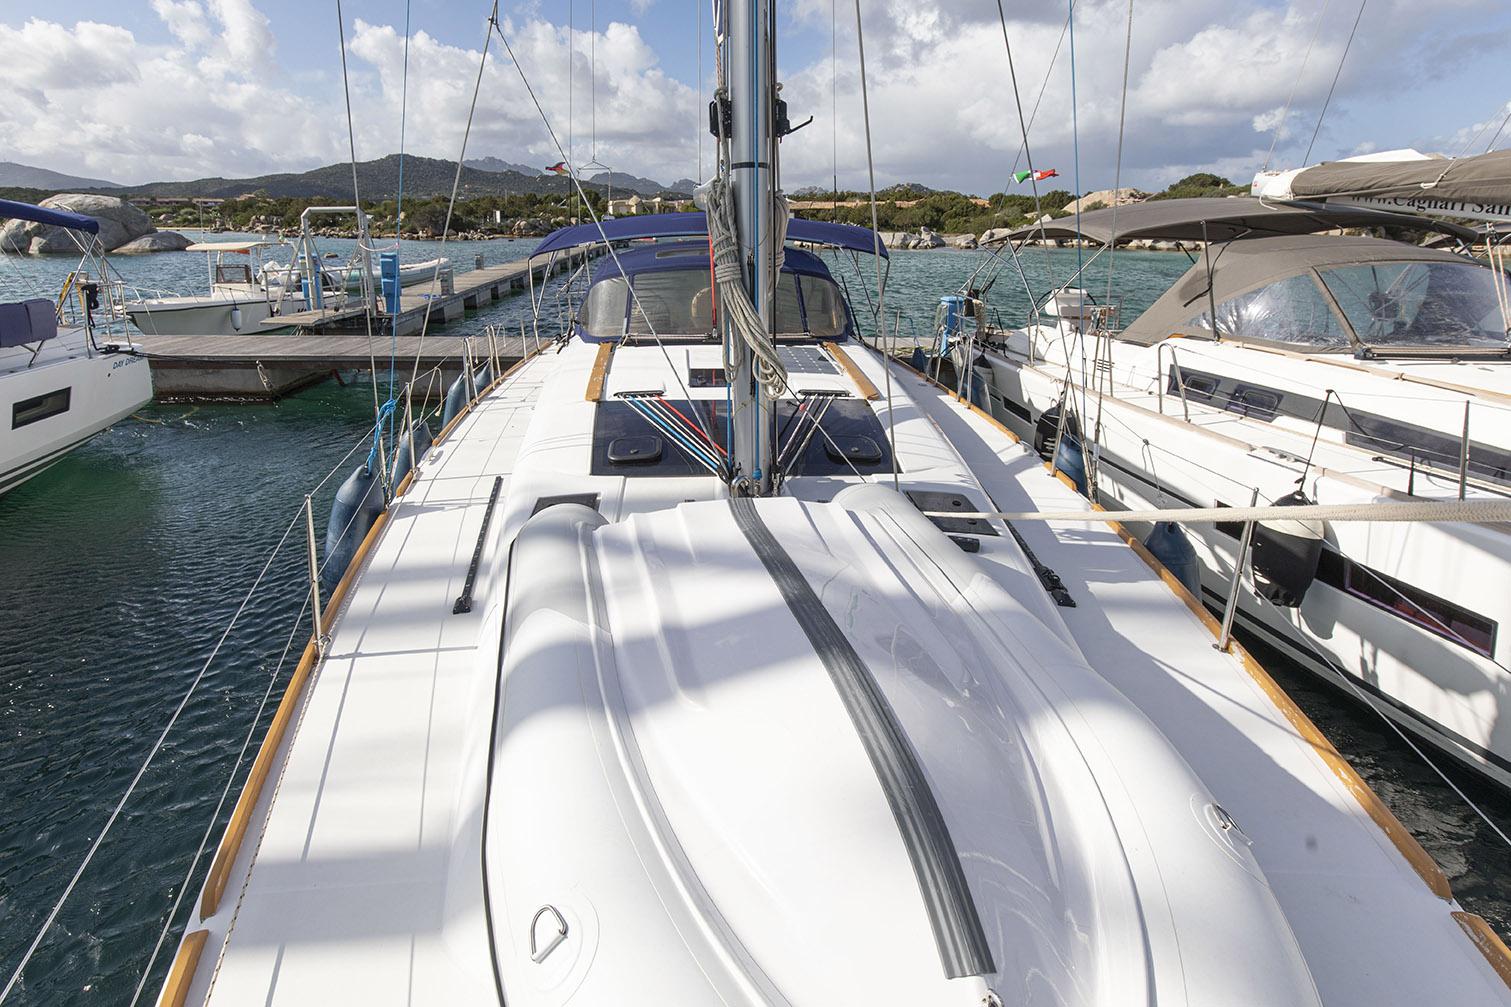 Dufour 460 Topsy Sun Charter